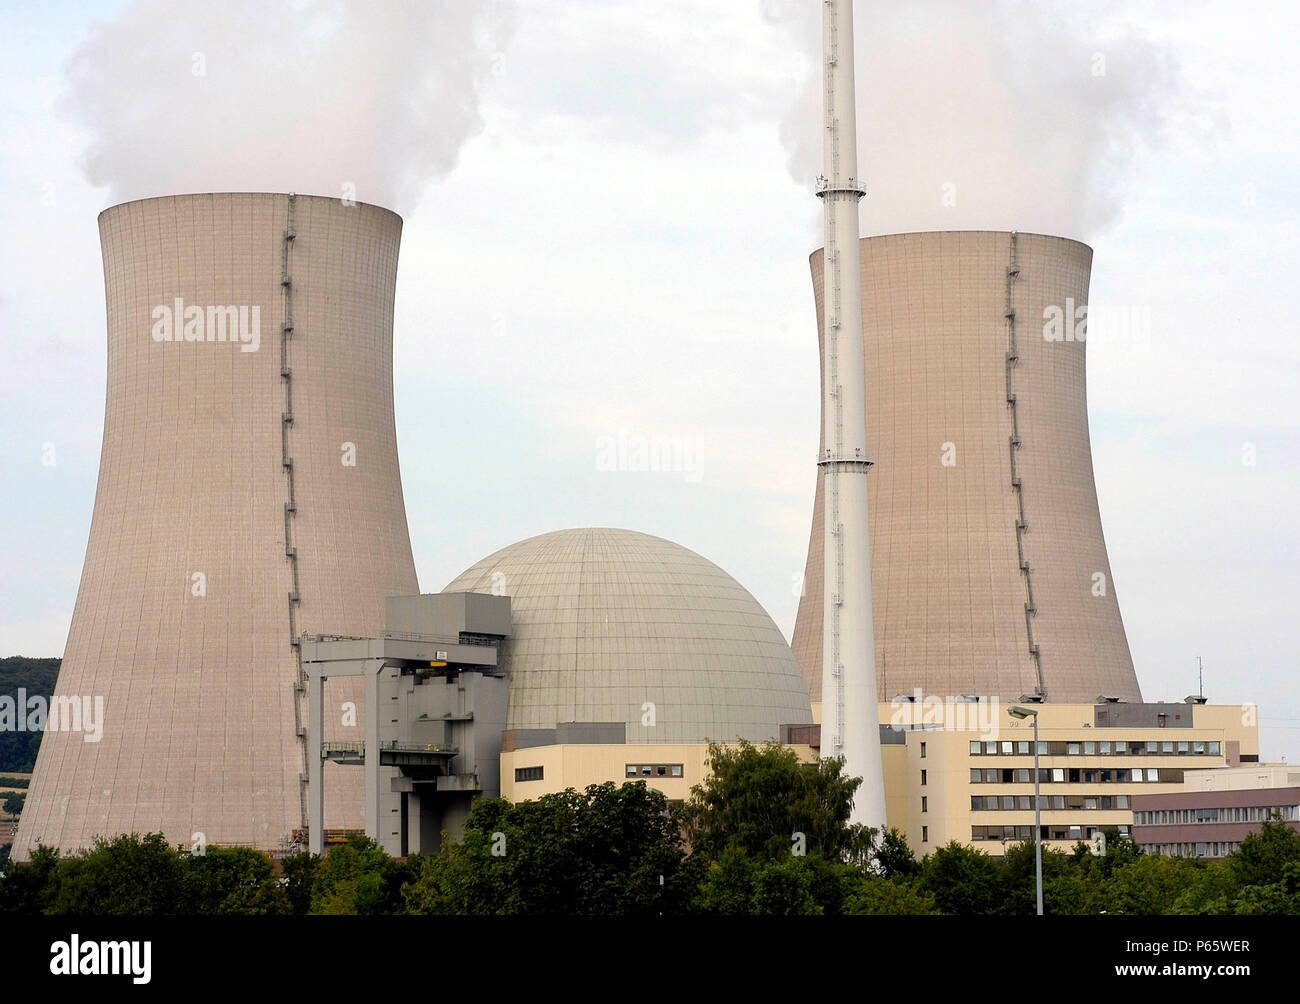 Atomic power plant Grohnde, Lower Saxony, Germany - Stock Image